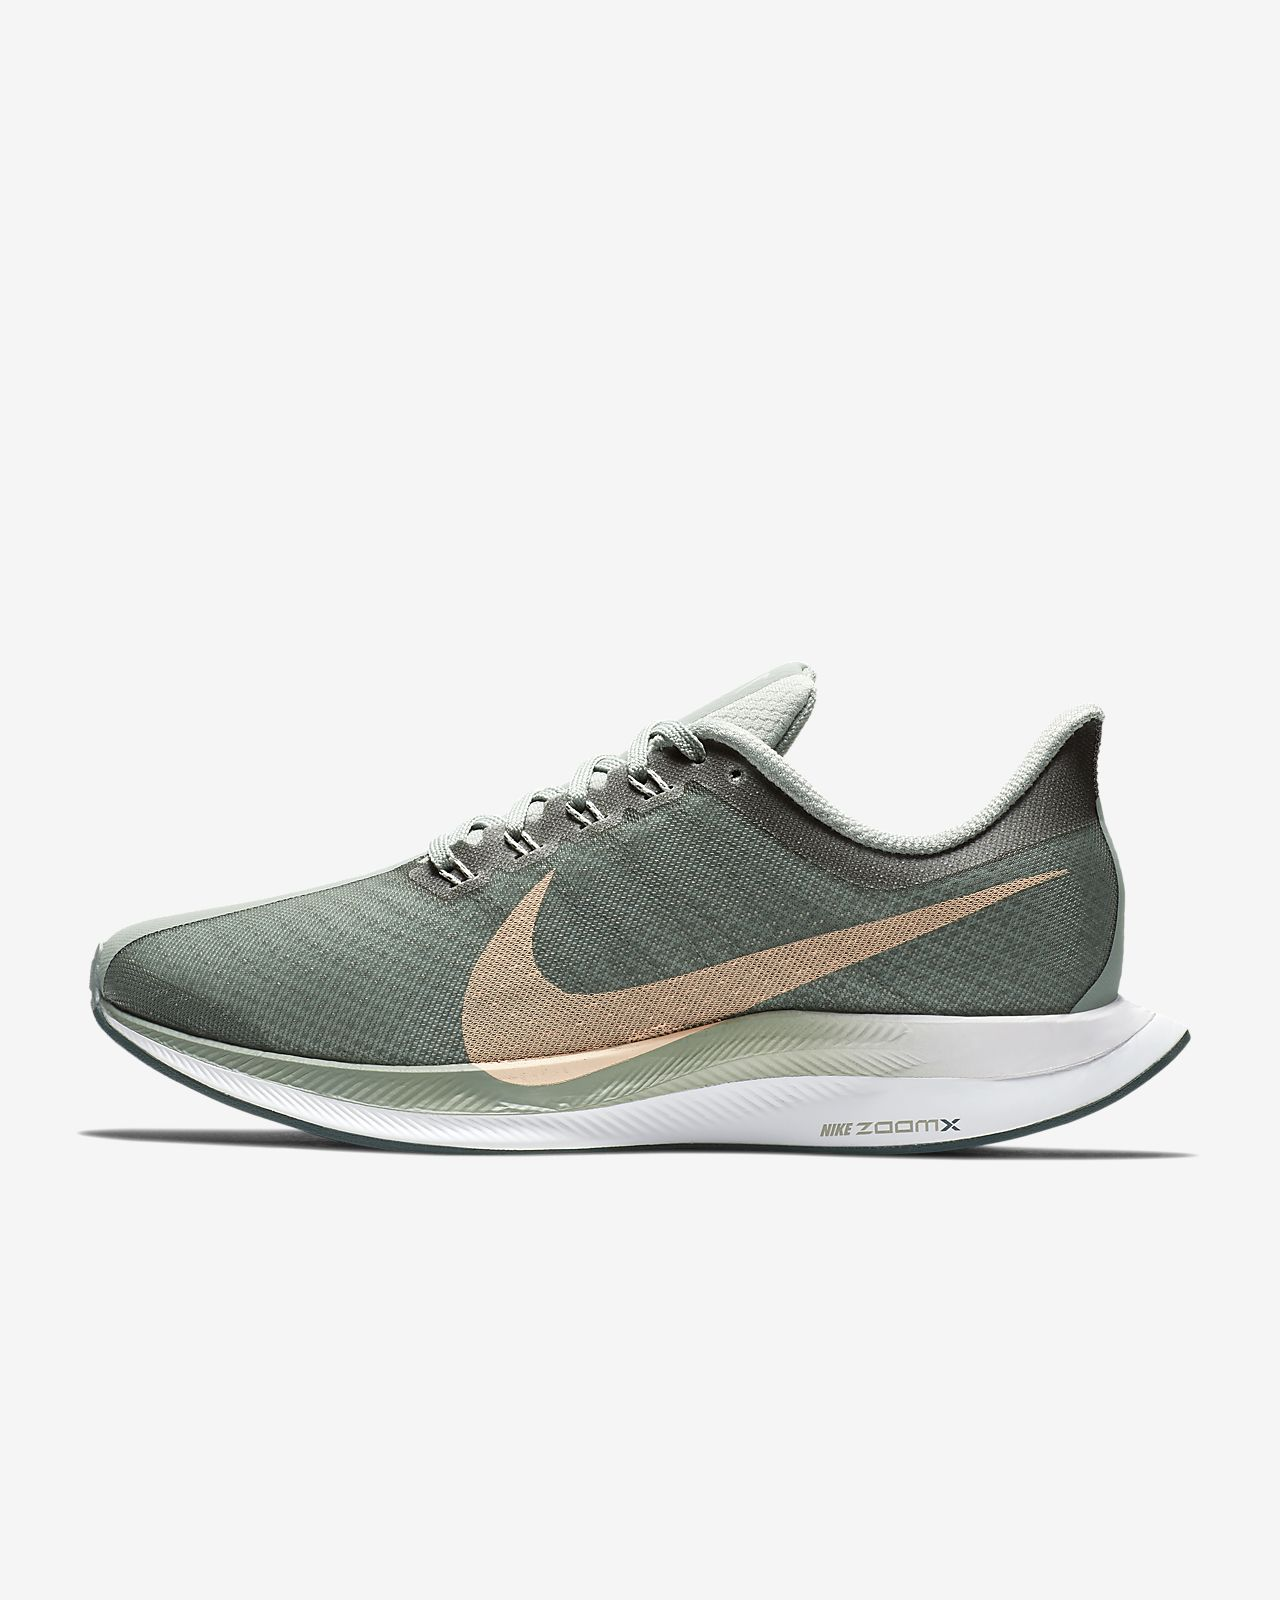 021755c996cb Nike Zoom Pegasus Turbo Women s Running Shoe. Nike.com LU